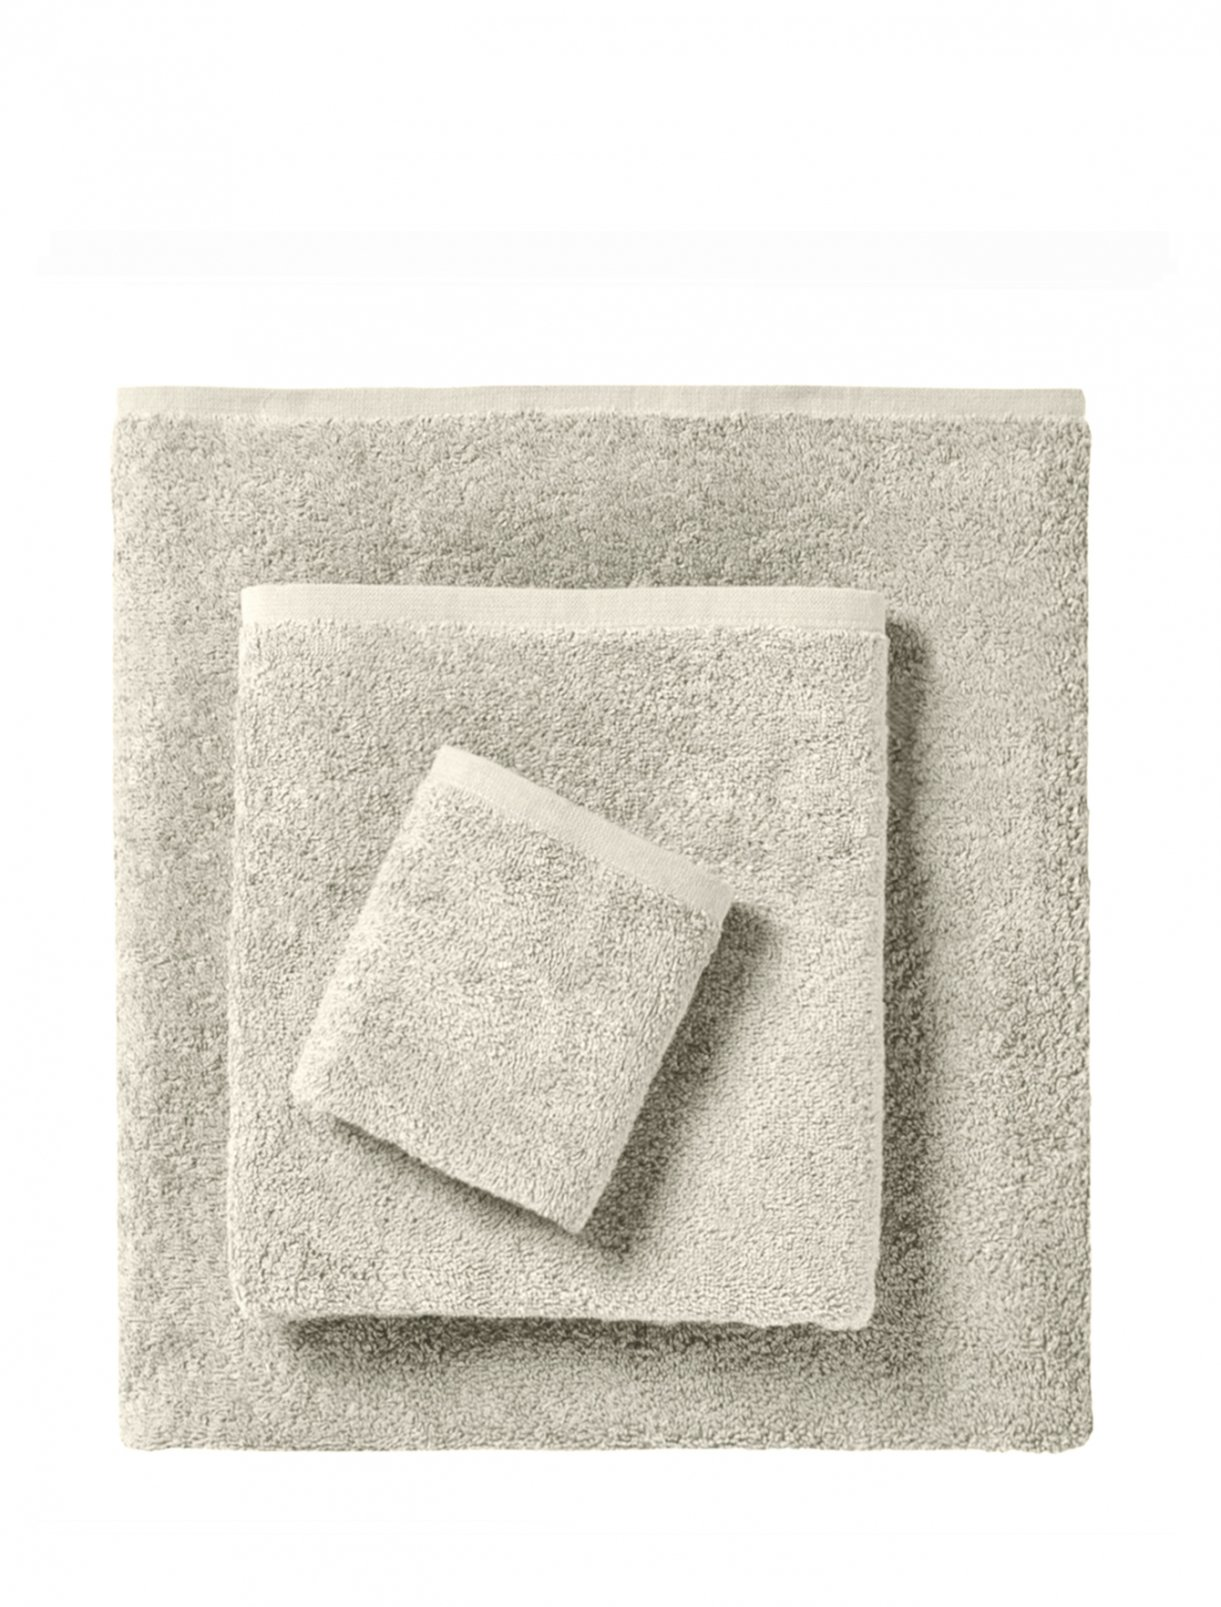 Полотенце 70 х 140 см Amalia home collection  –  Общий вид